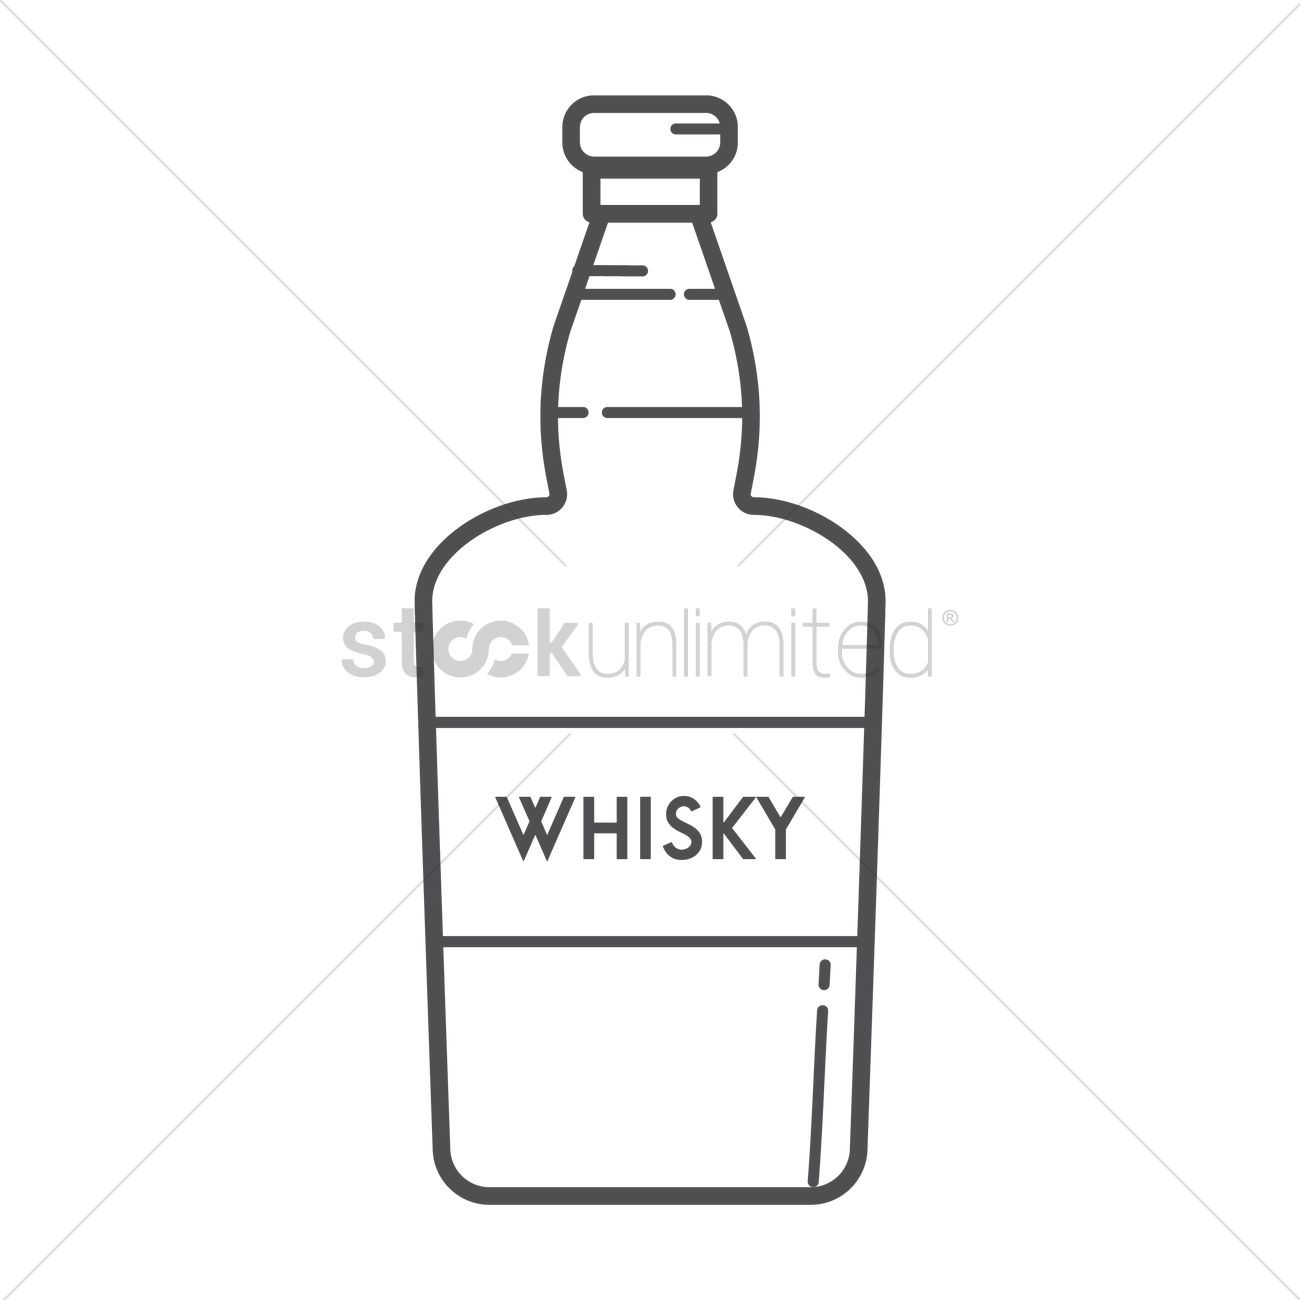 Whisky Bottle Vector Image